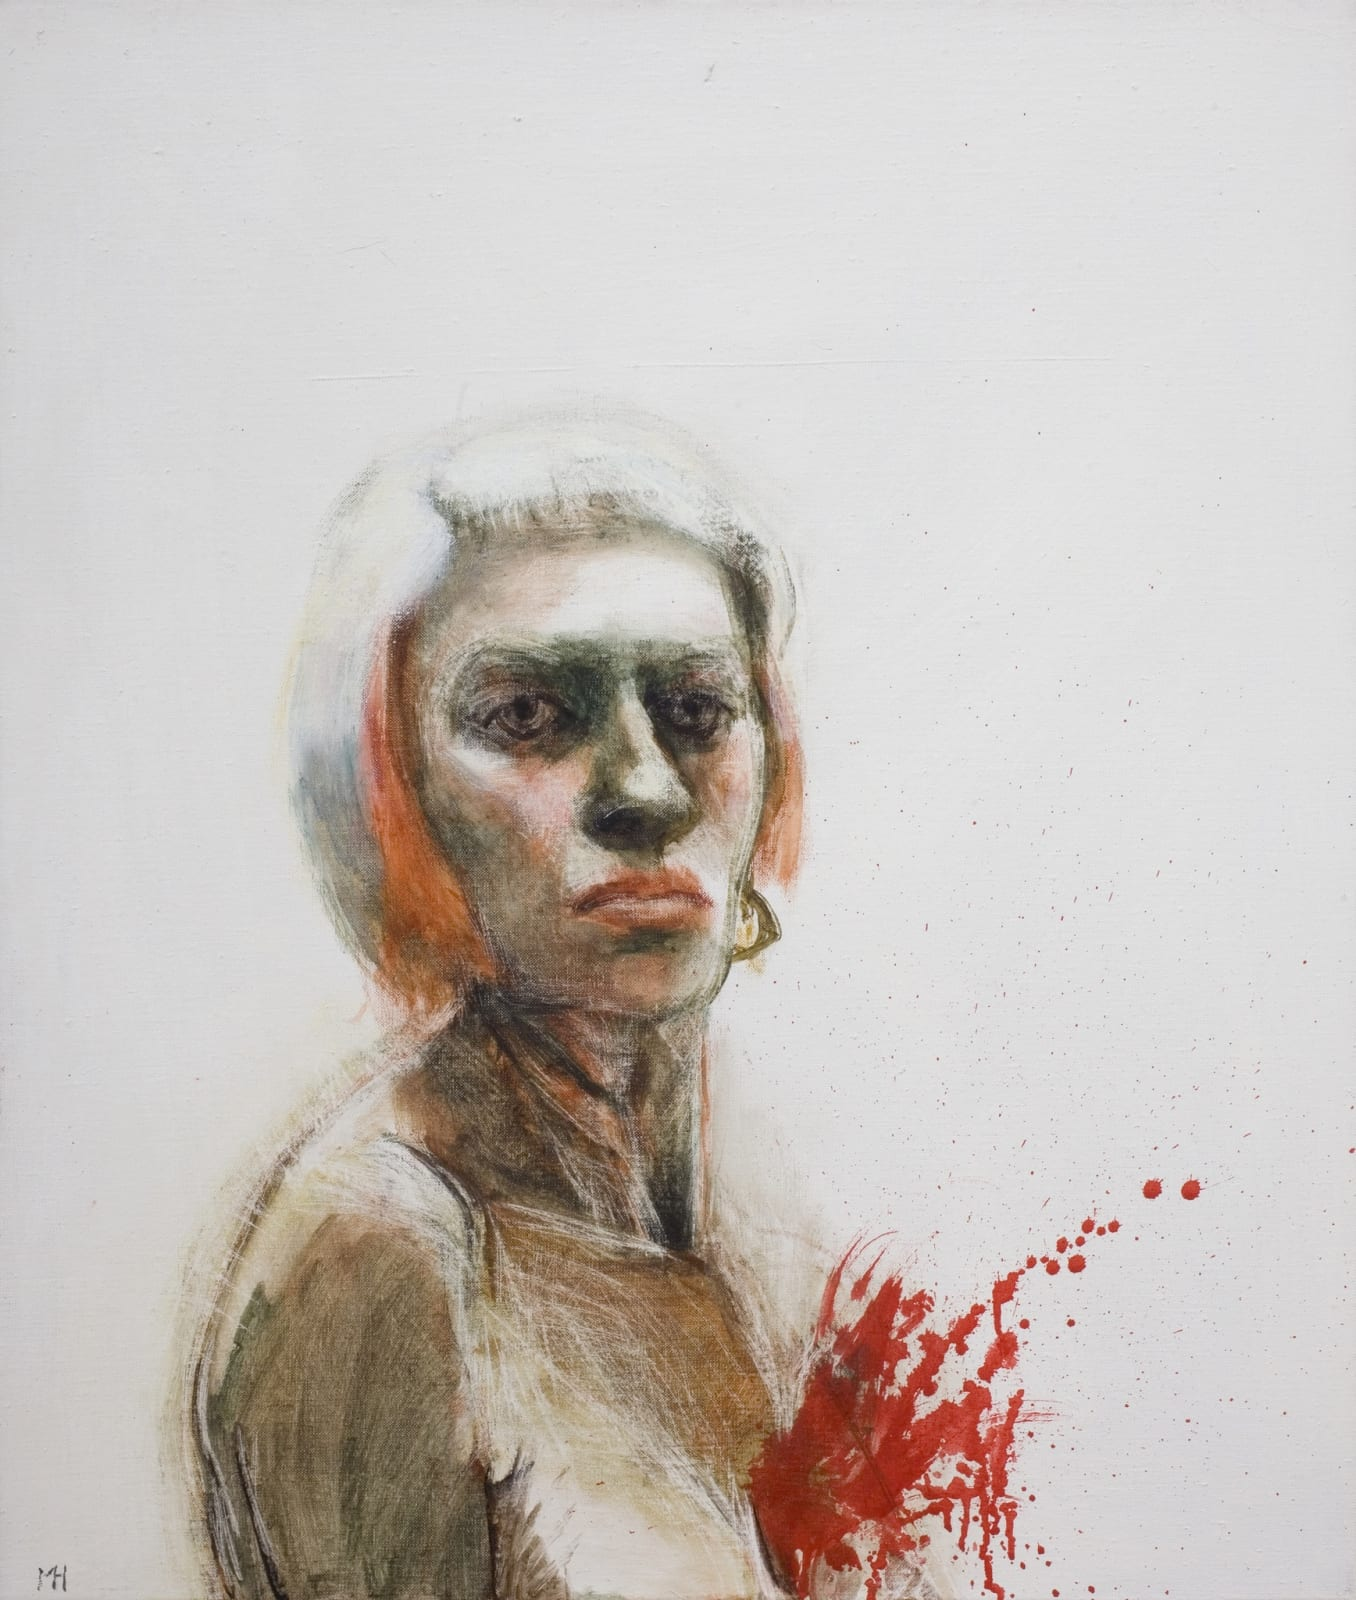 Marcelle Hanselaar, Self-Portrait with Exploding Chest, 2008